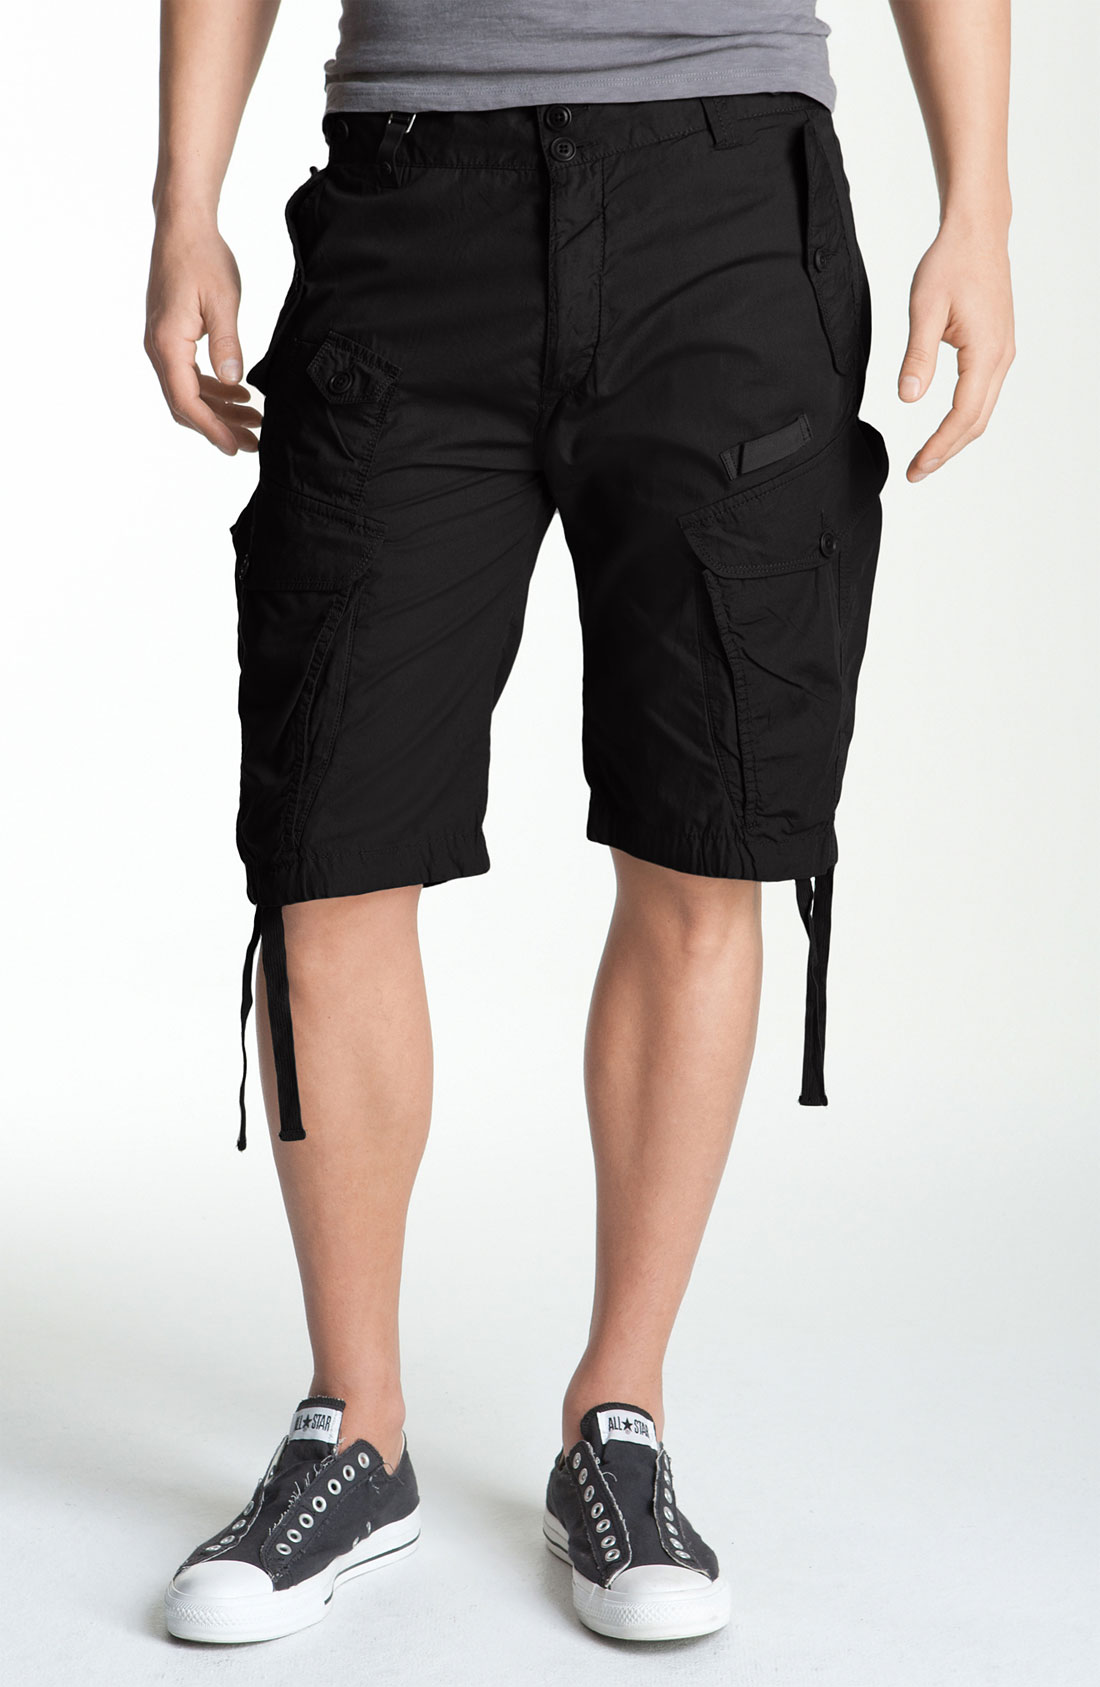 Tru-Spec ST CARGO PANTS,BLACK, MENS, POLY COTTON, W L Sold by Vir Ventures + 1. $ $ Basic Editions Women's Capri Cargo Pants (6) Sold by Kmart.